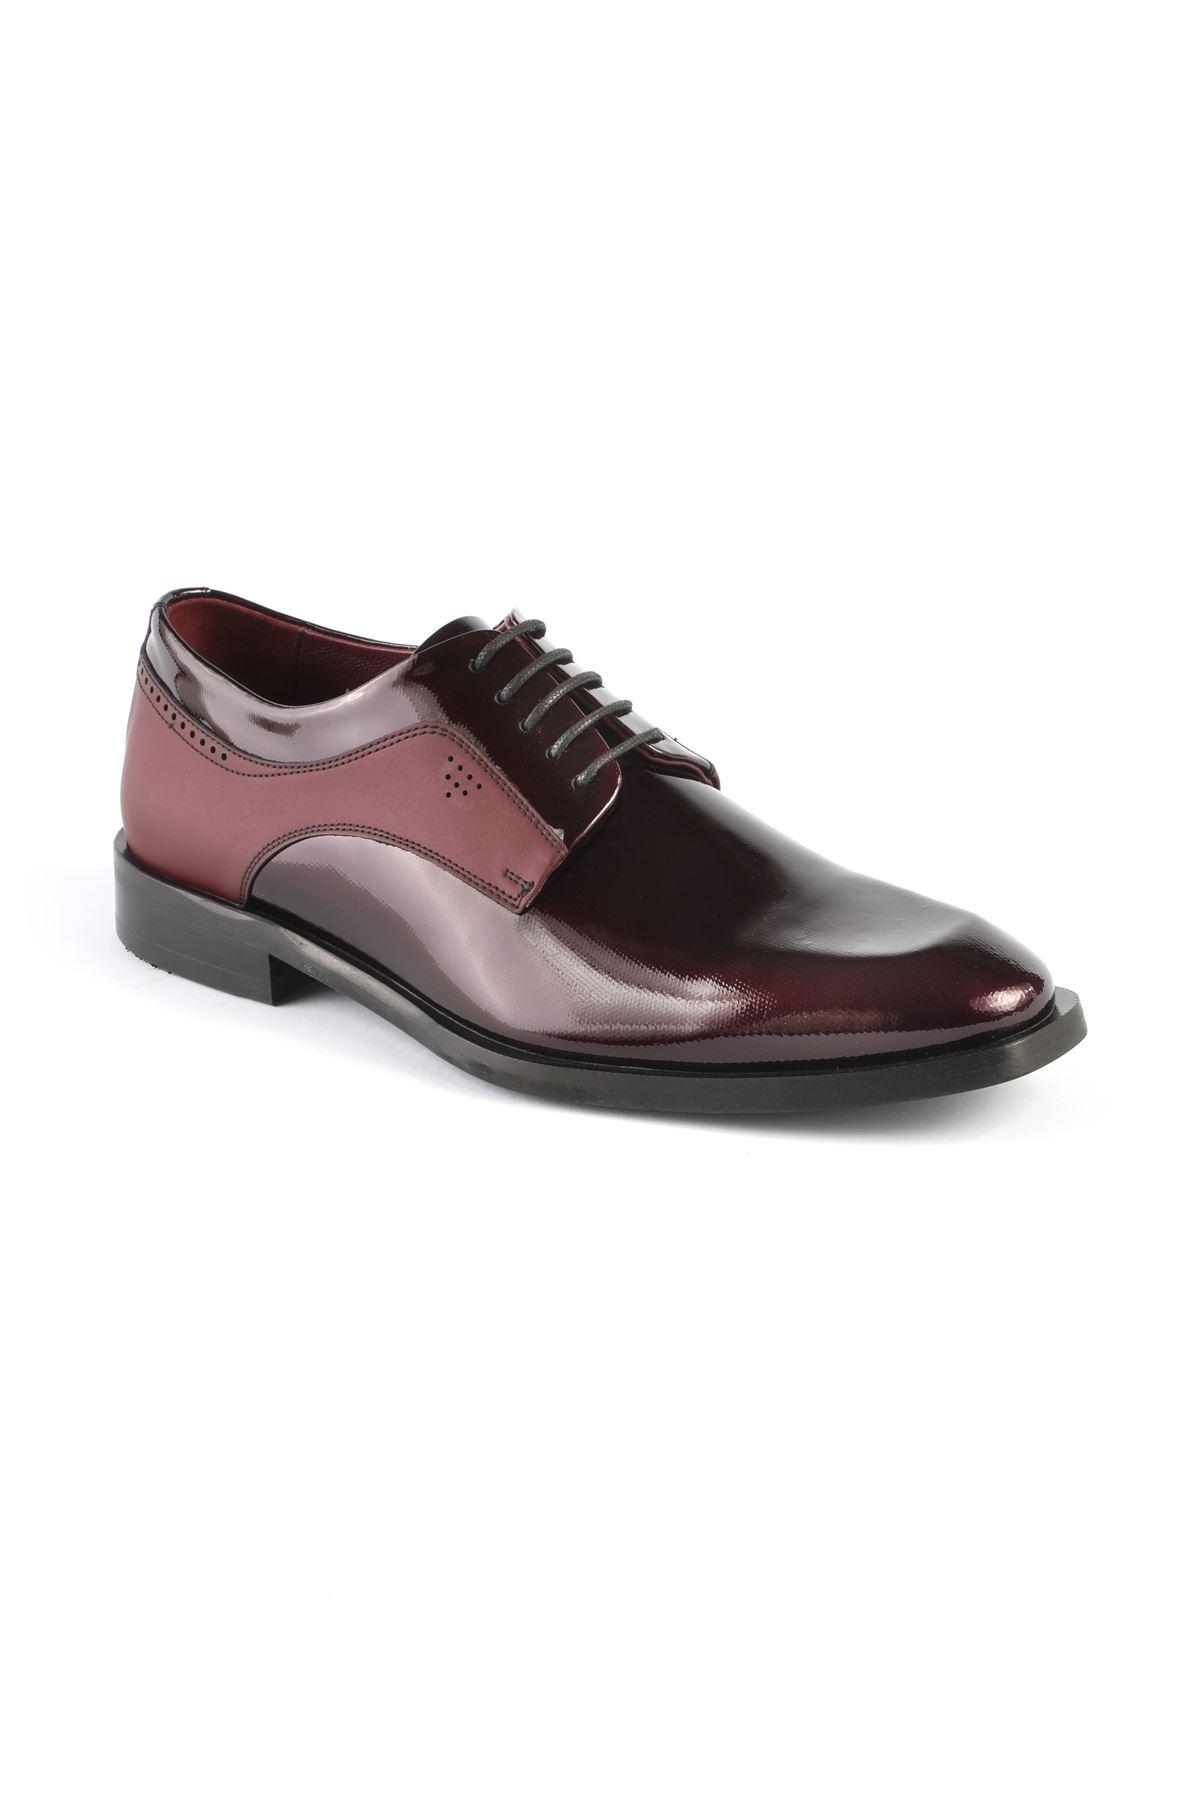 Libero L3252 Claret Red Classic Shoes